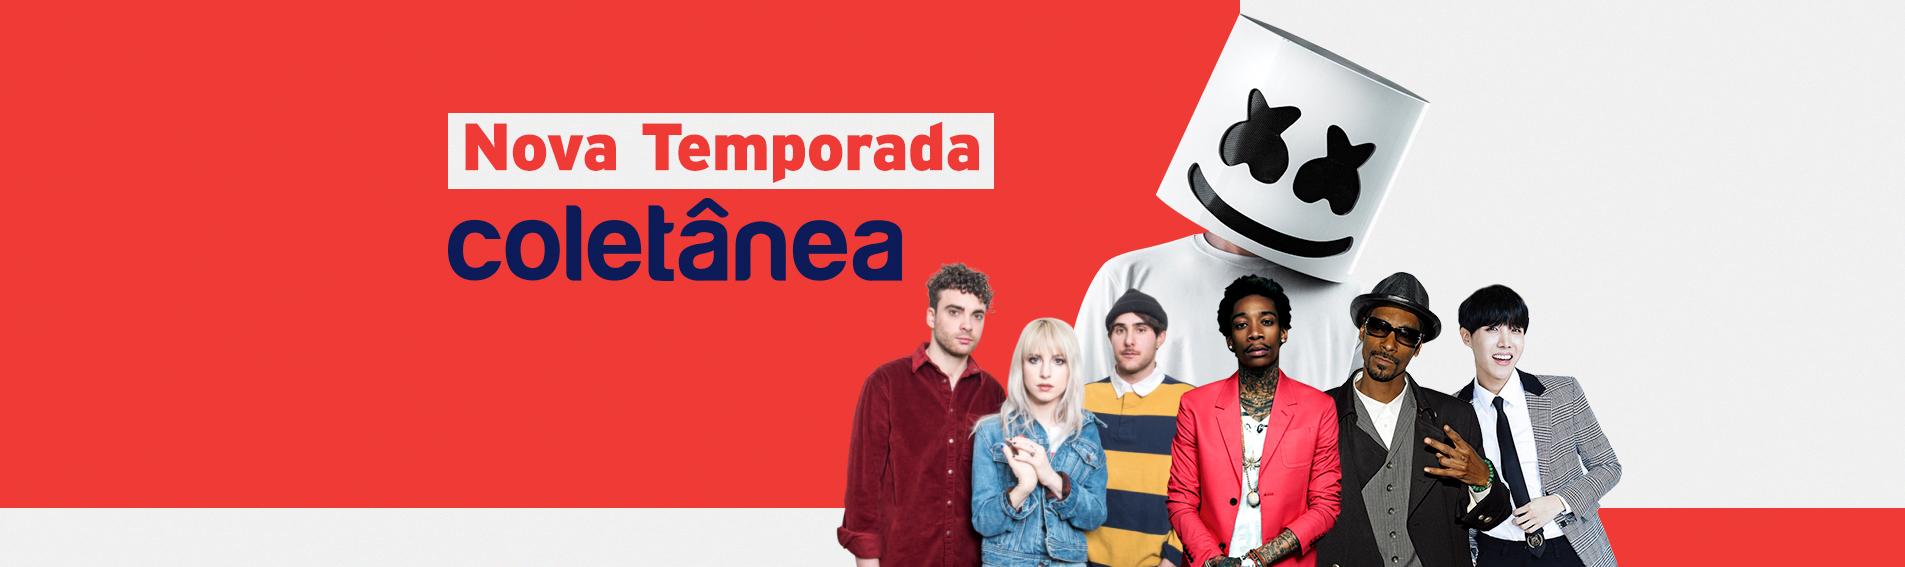 Banner Coletânea Nova Temporada